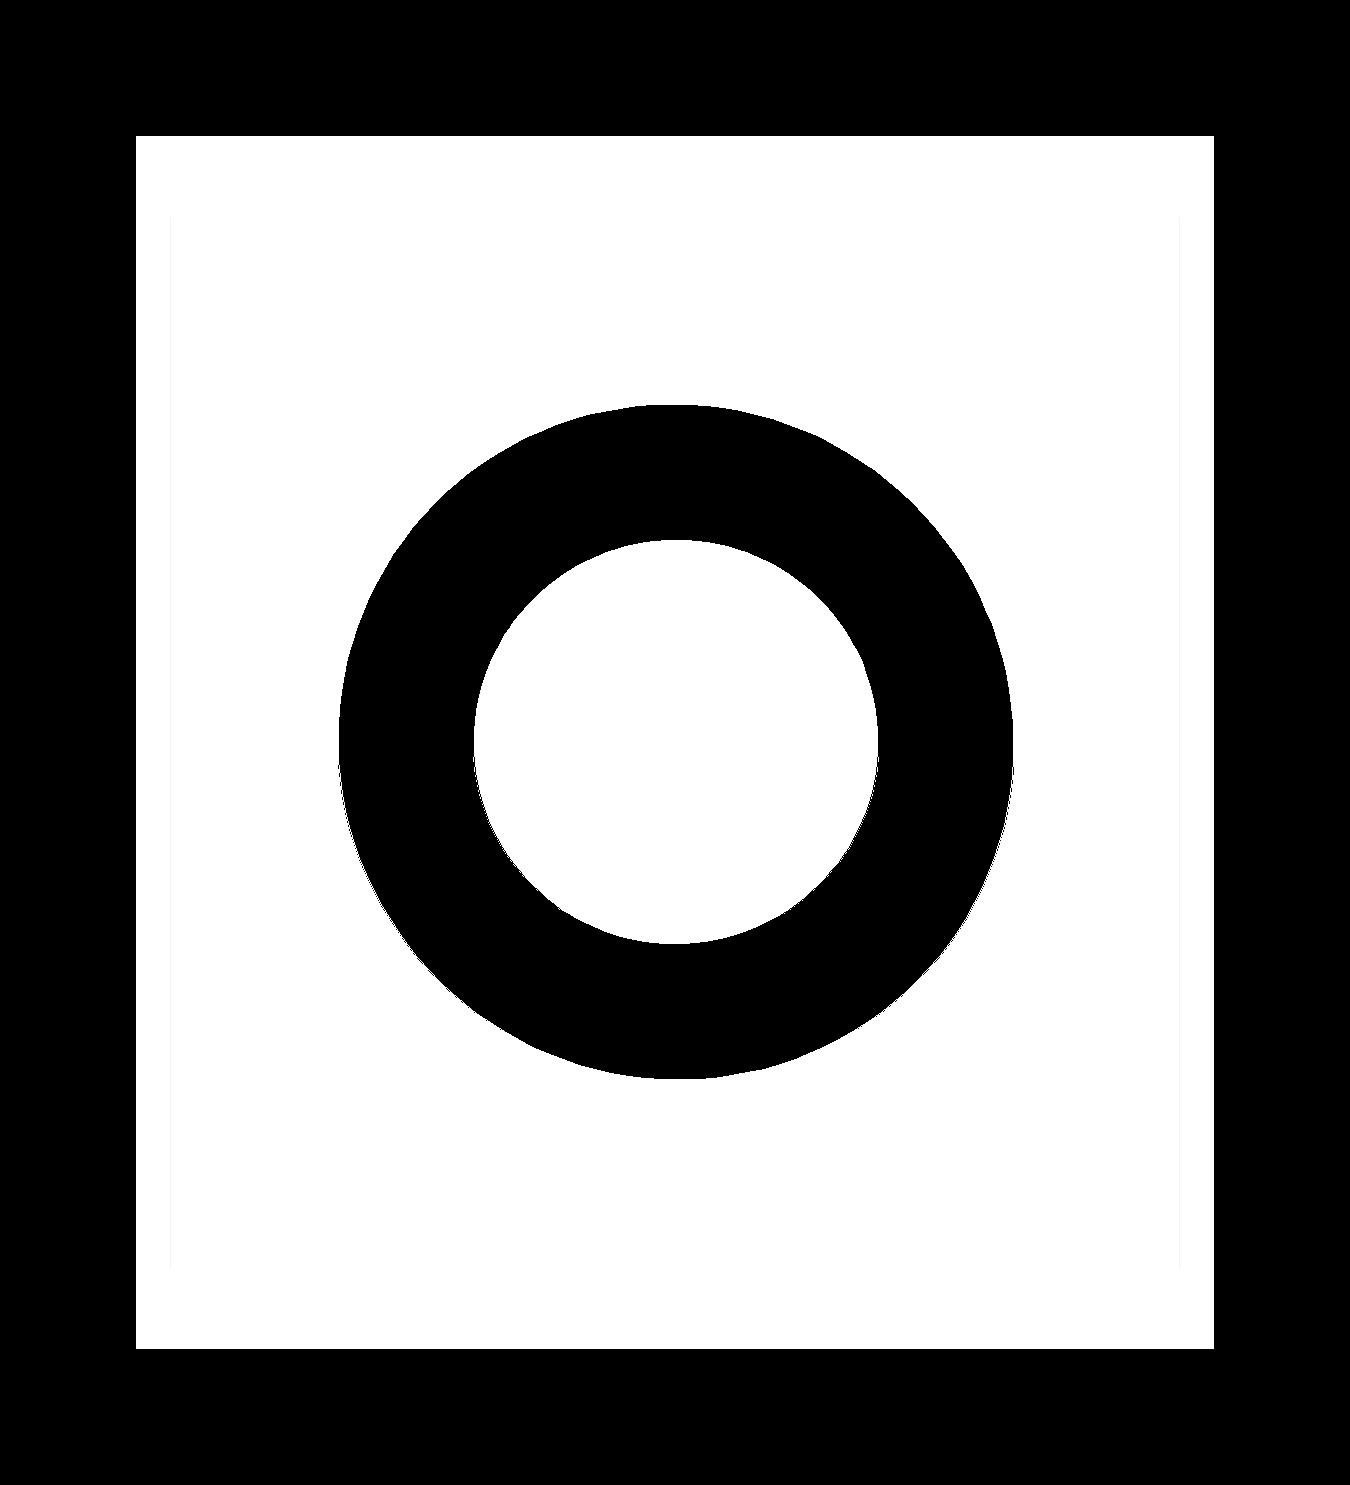 Academy ichart an eye test chart this program will generate an accurate logmar and snellen eye test chart geenschuldenfo Gallery